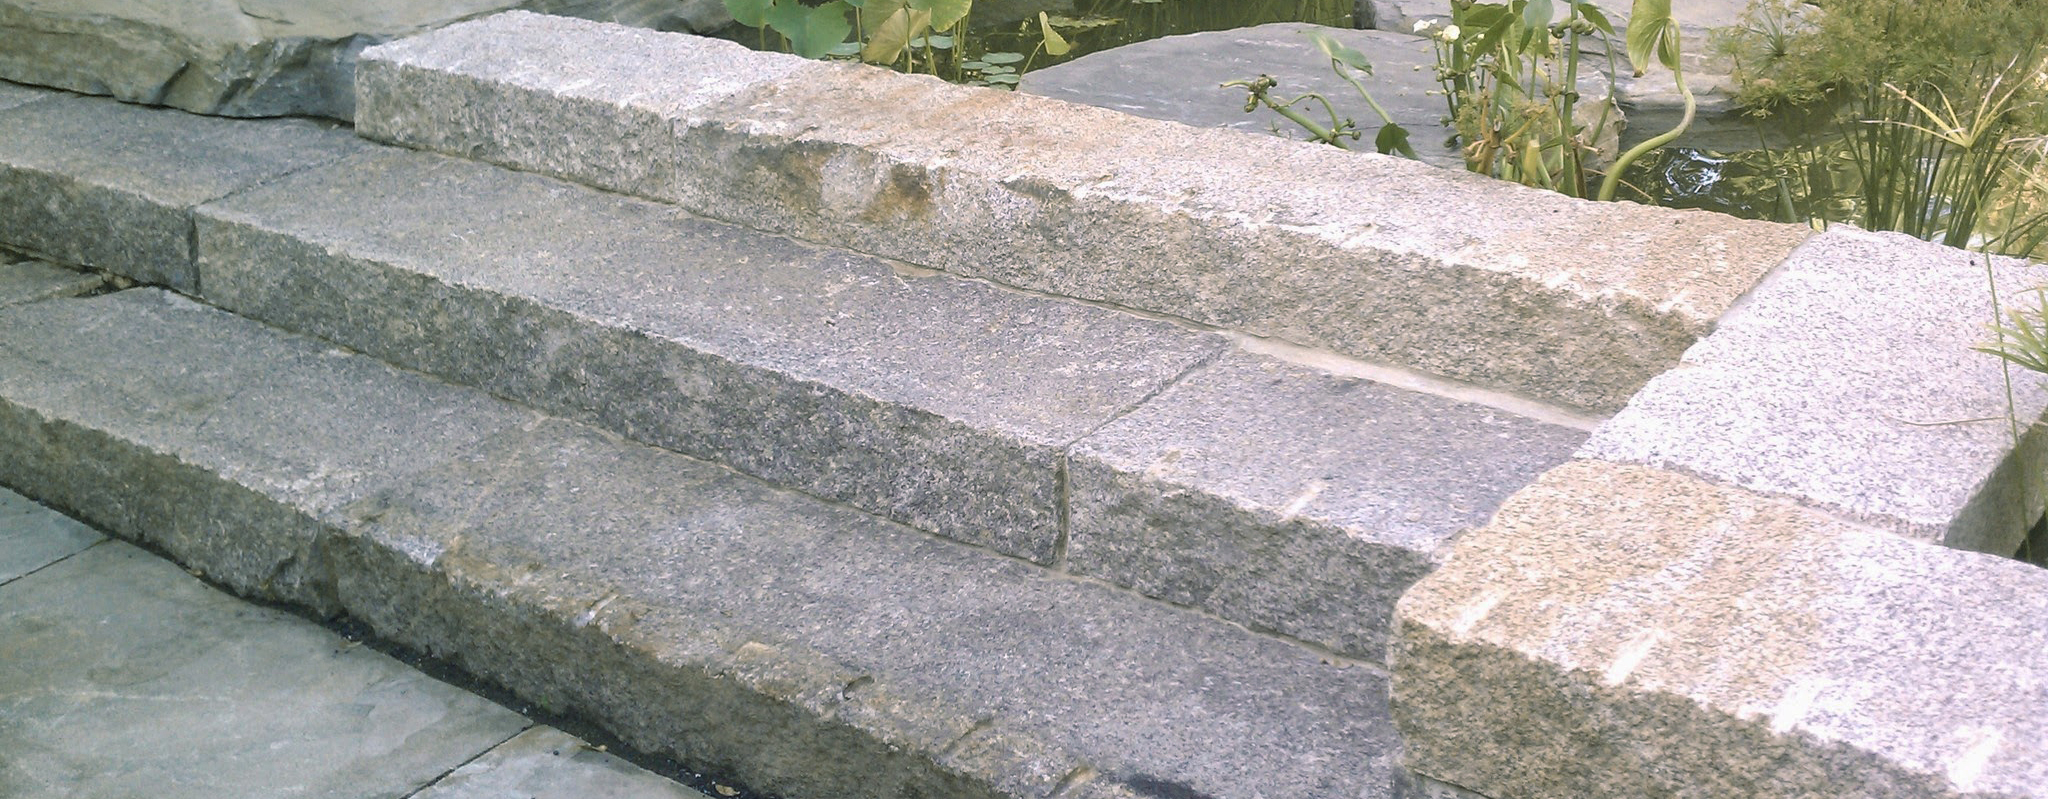 Reclaimed granite steps - Stone Curators